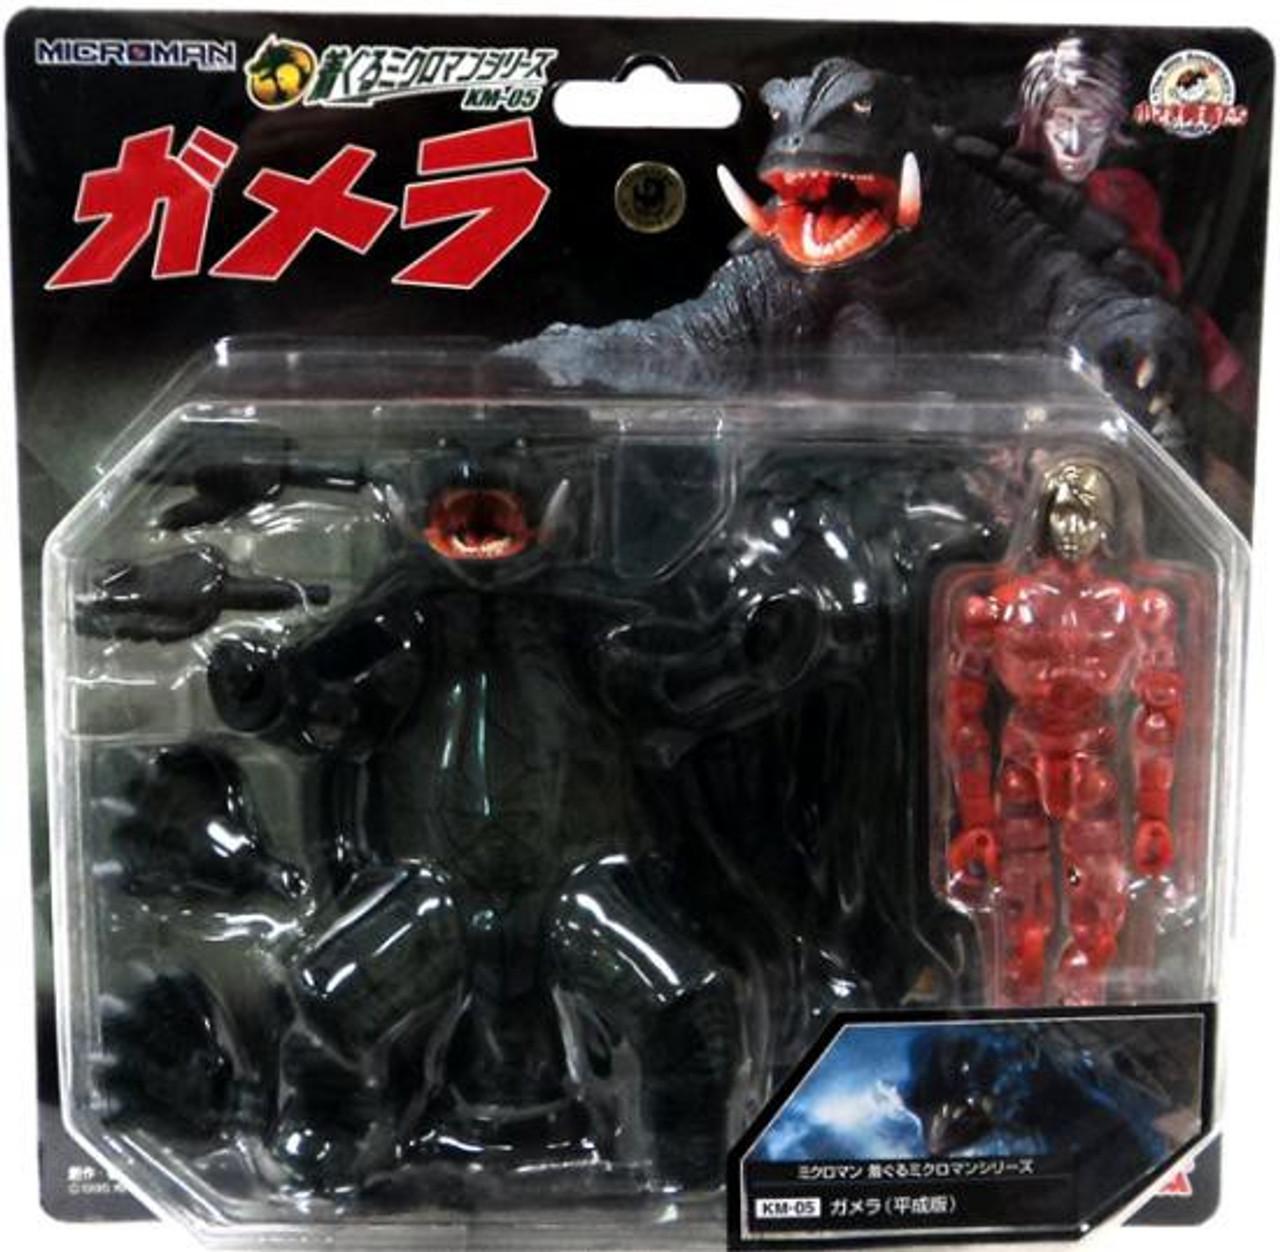 Godzilla Microman Gamera Figure KM-05 [Heisei Version]